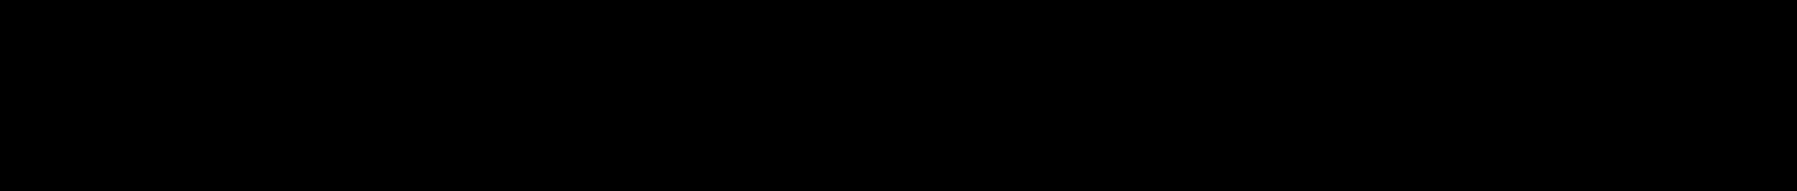 Solomon Light Deco